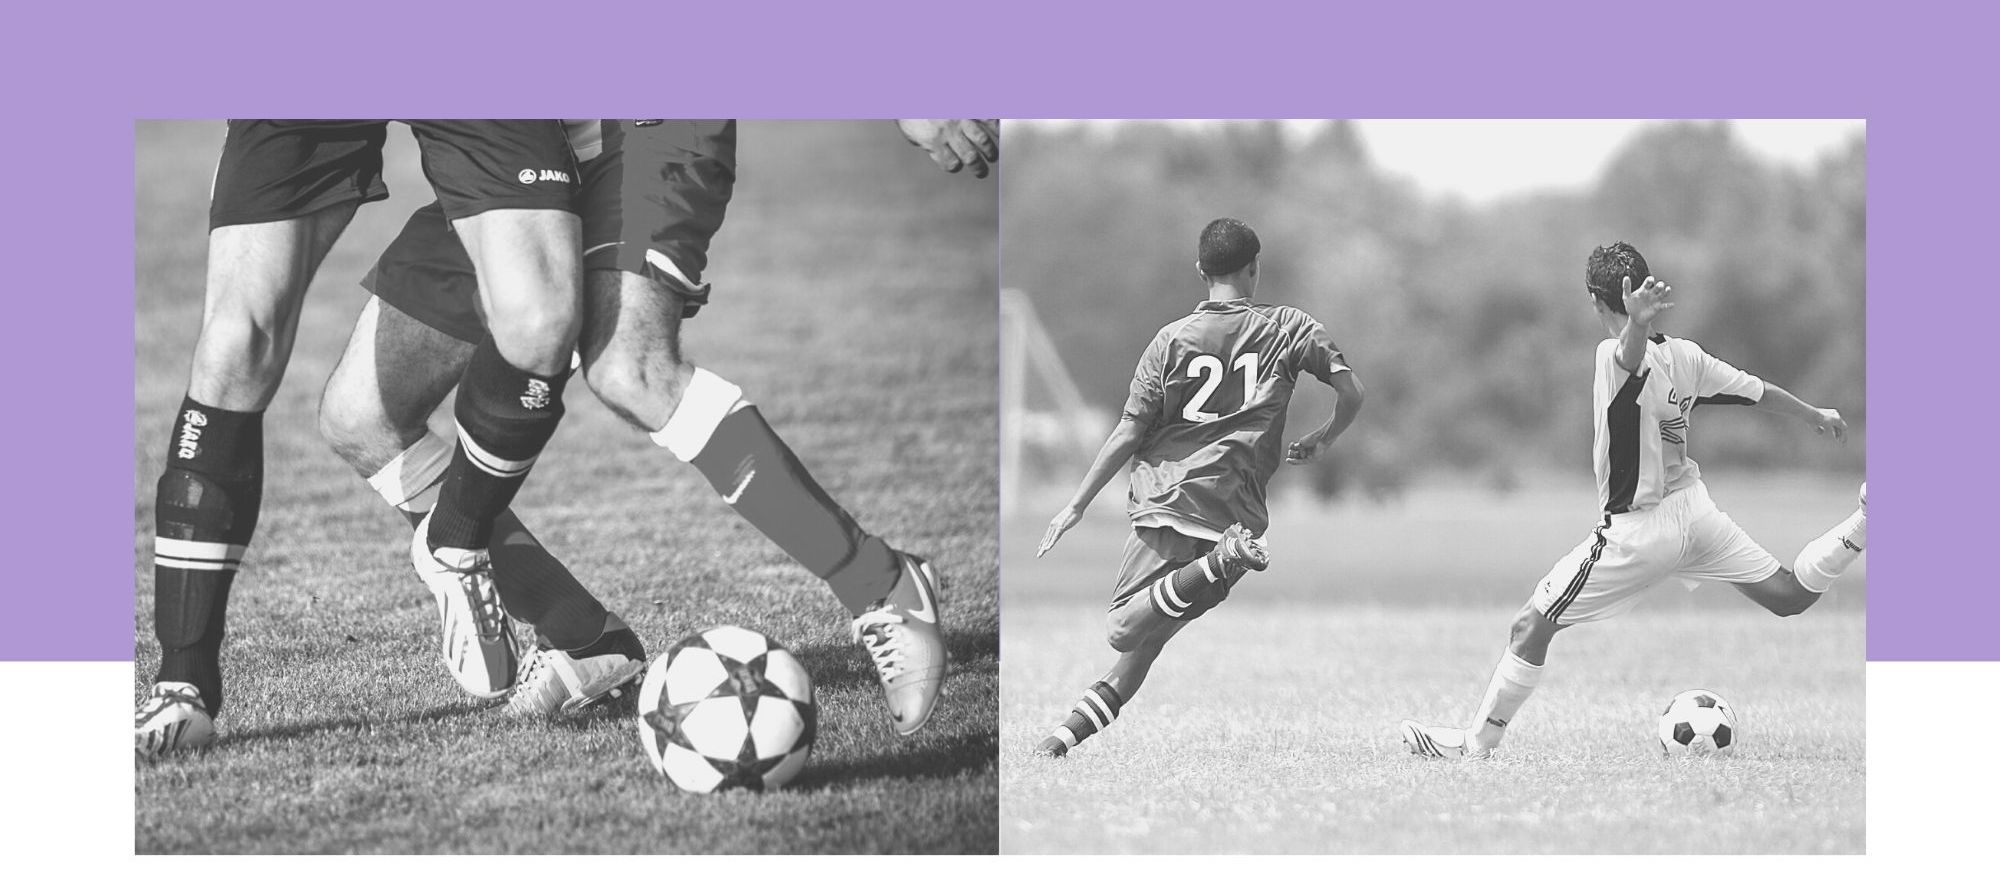 Illustrations footballeurs en action